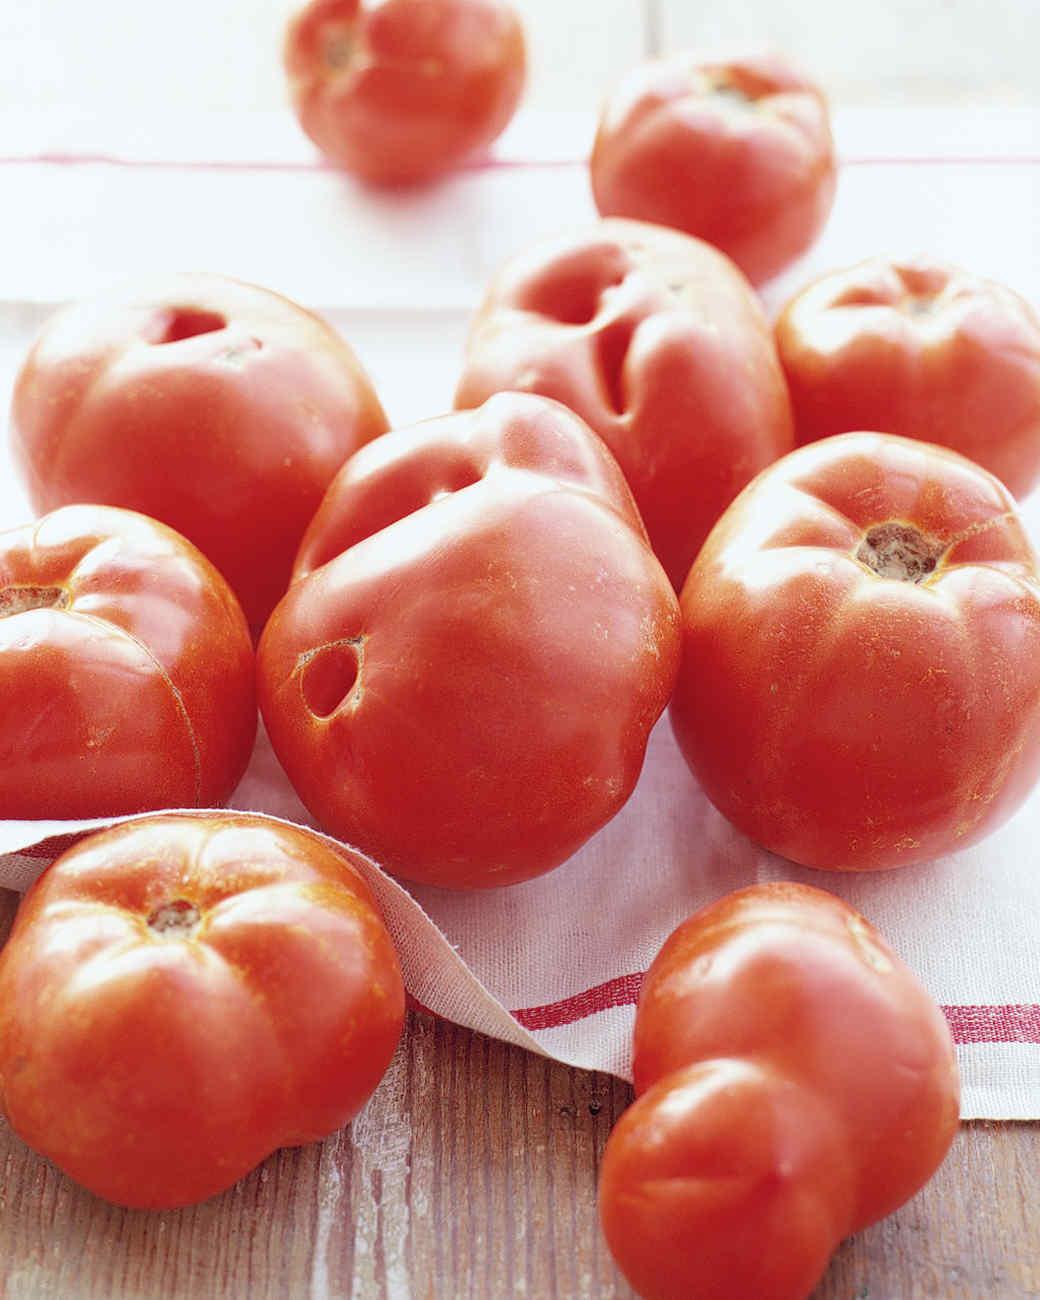 a99835_ripetomatoes1.jpg